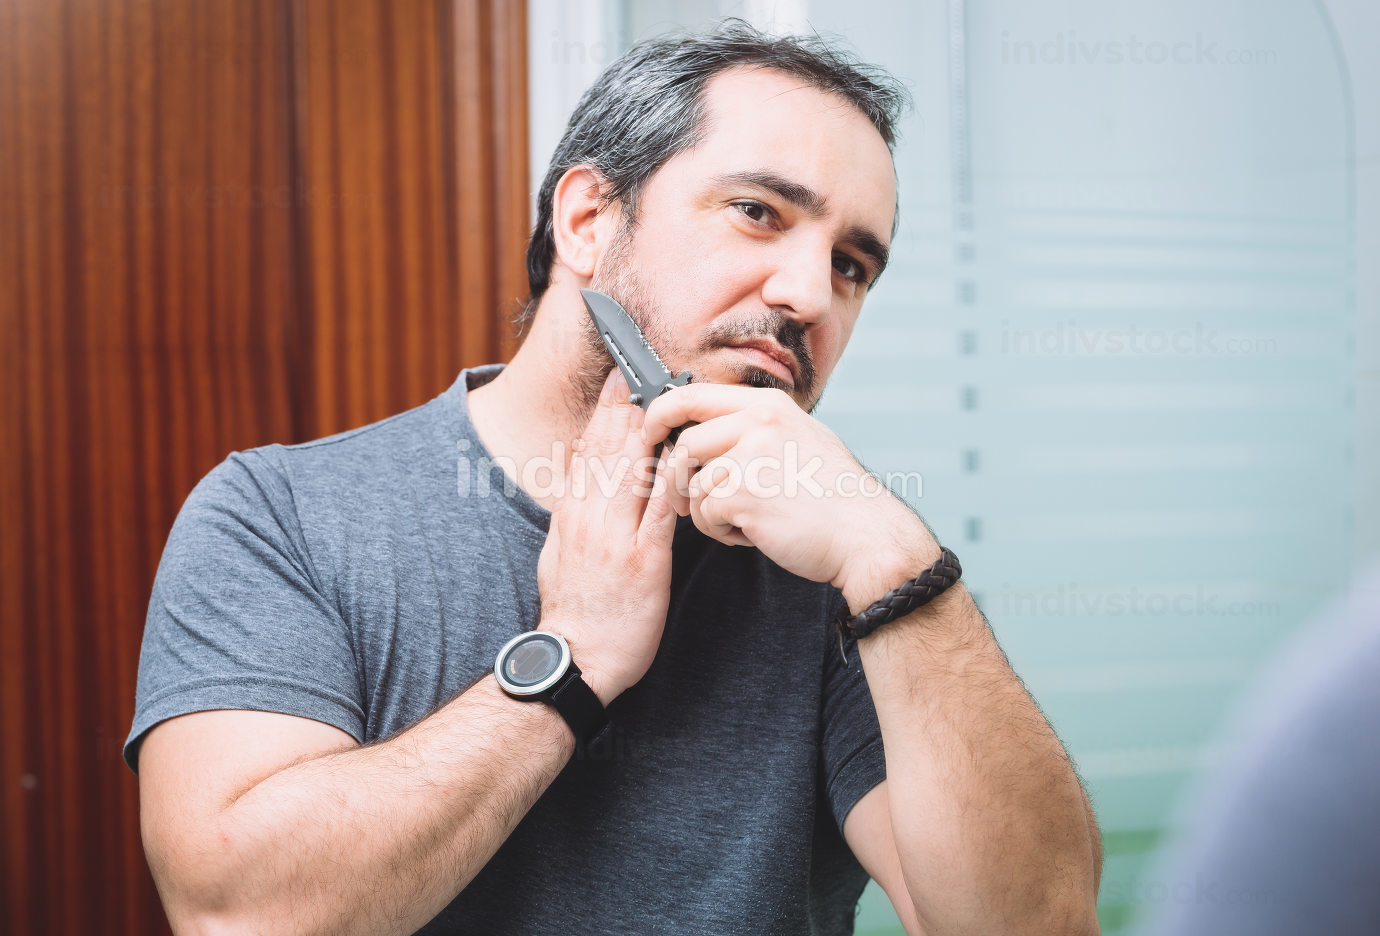 40s man shaving with sharp hunting knife